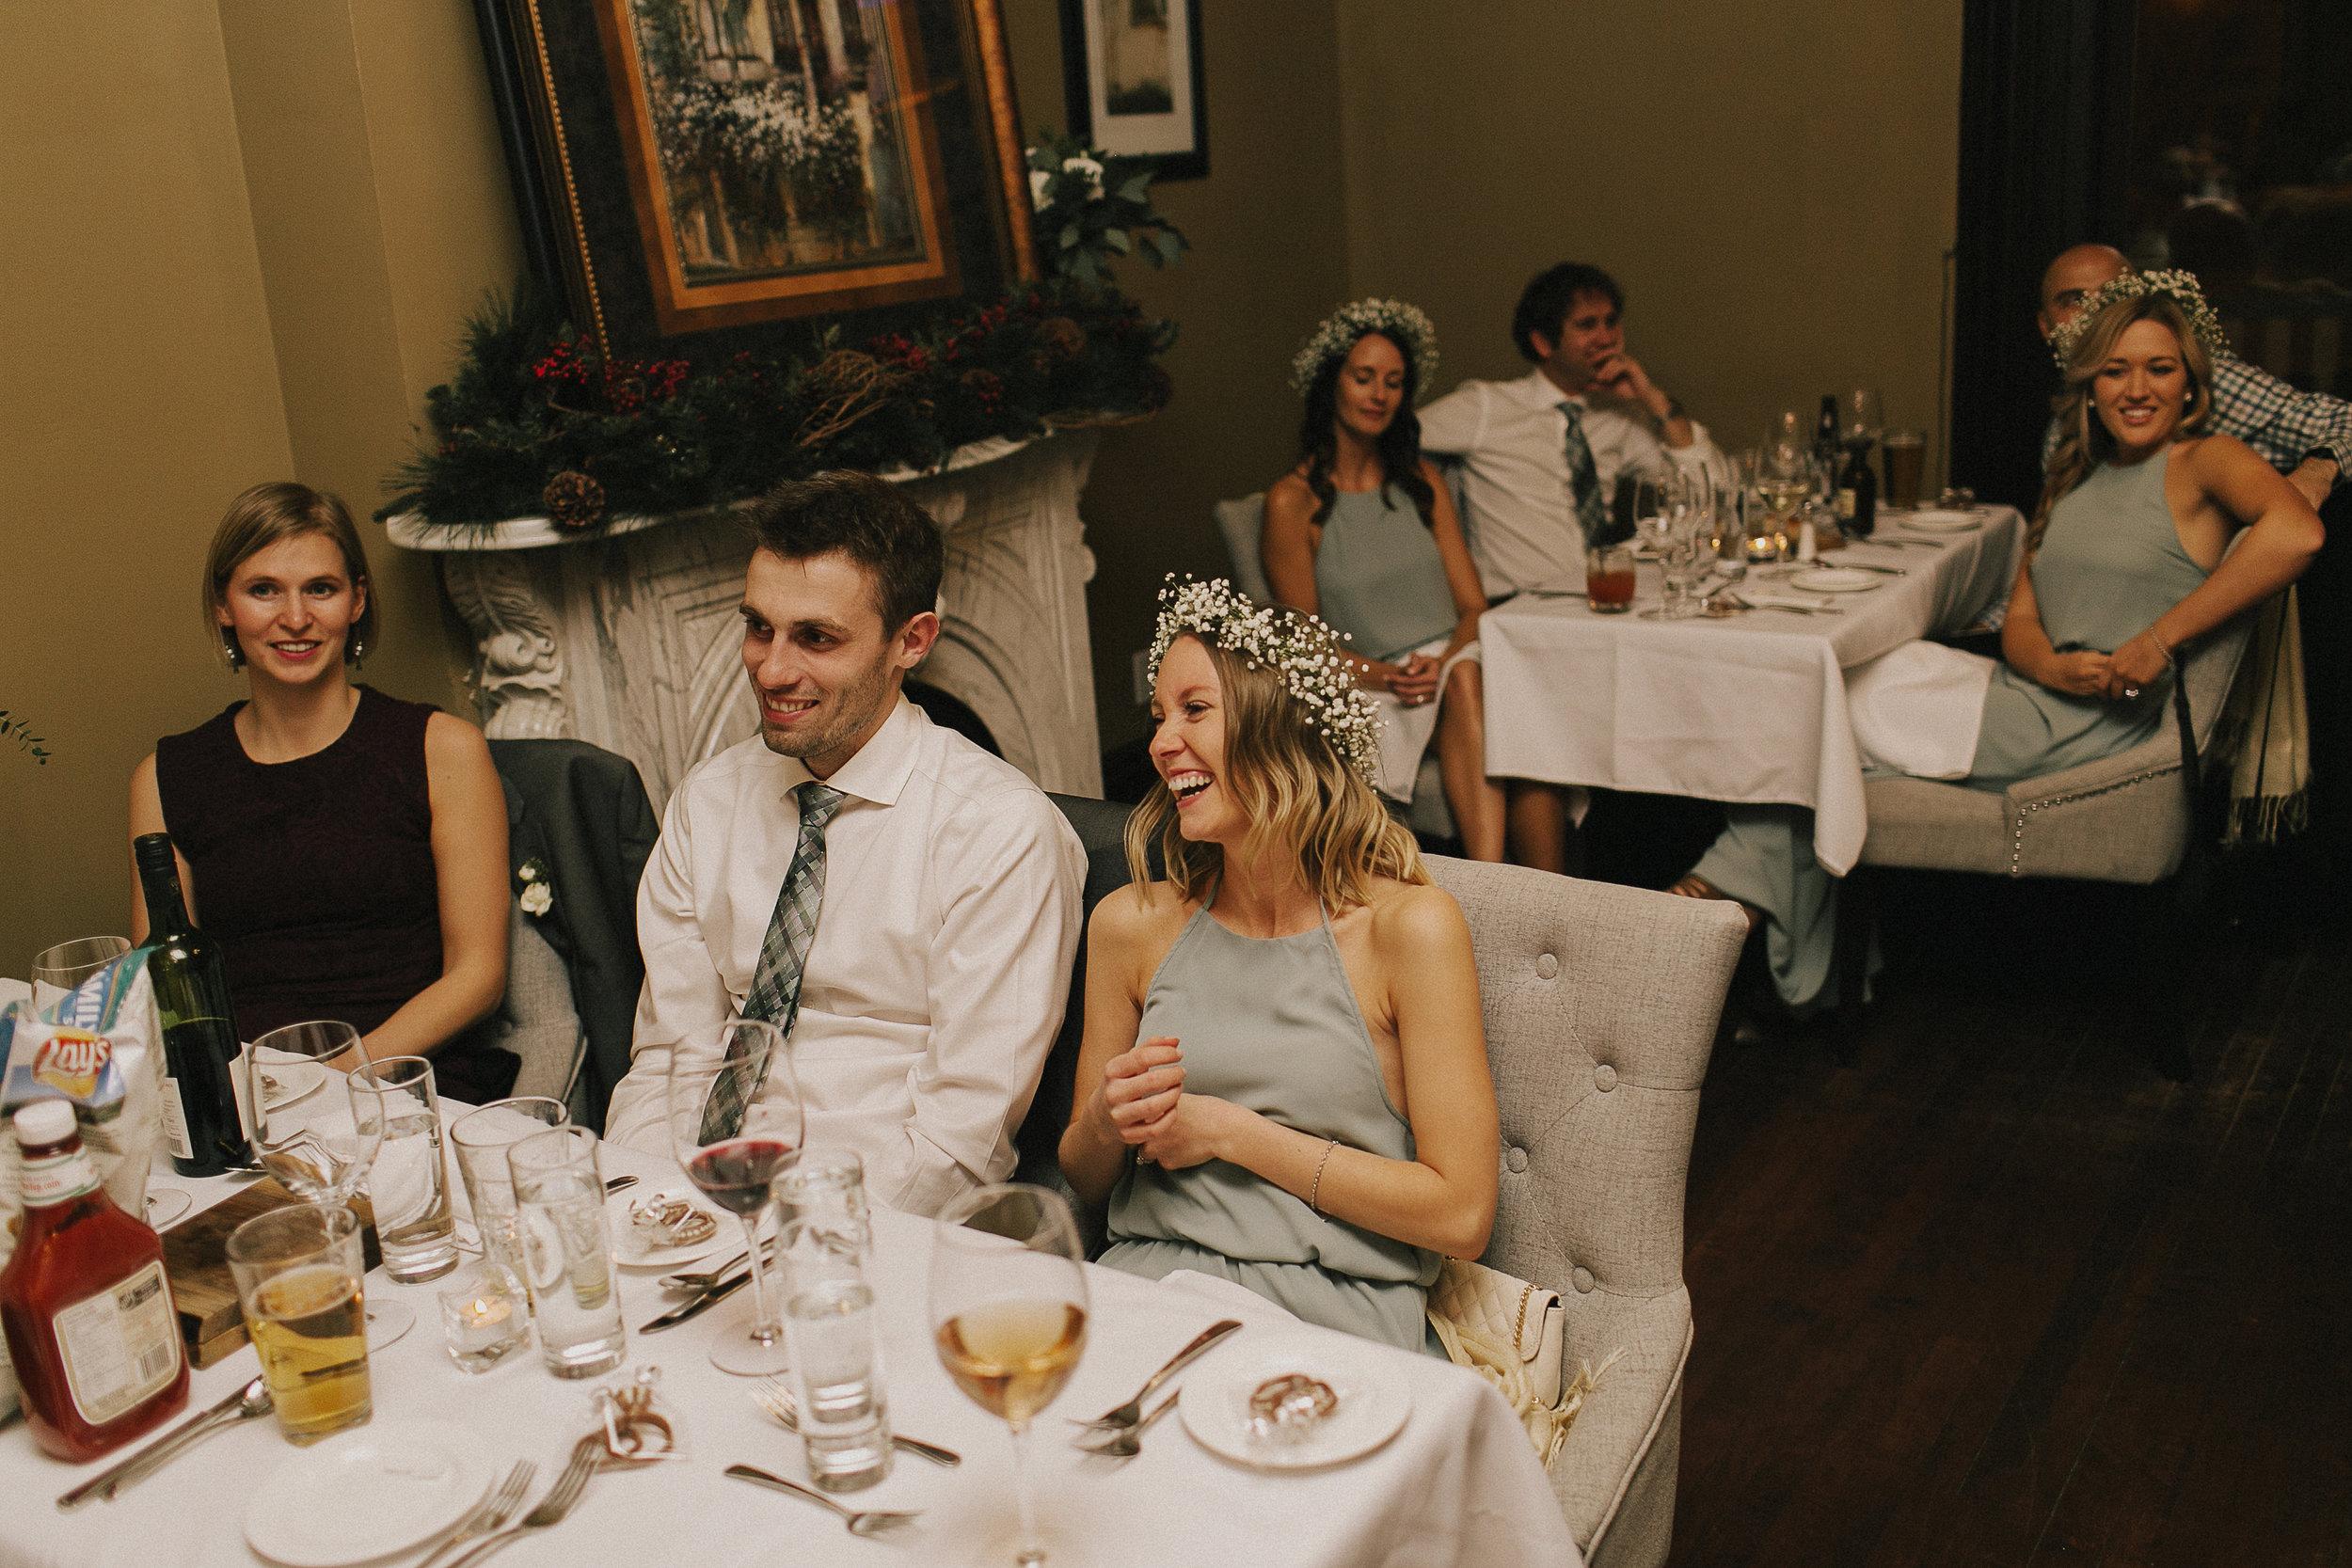 mark-and-liz-wedding-528.jpg